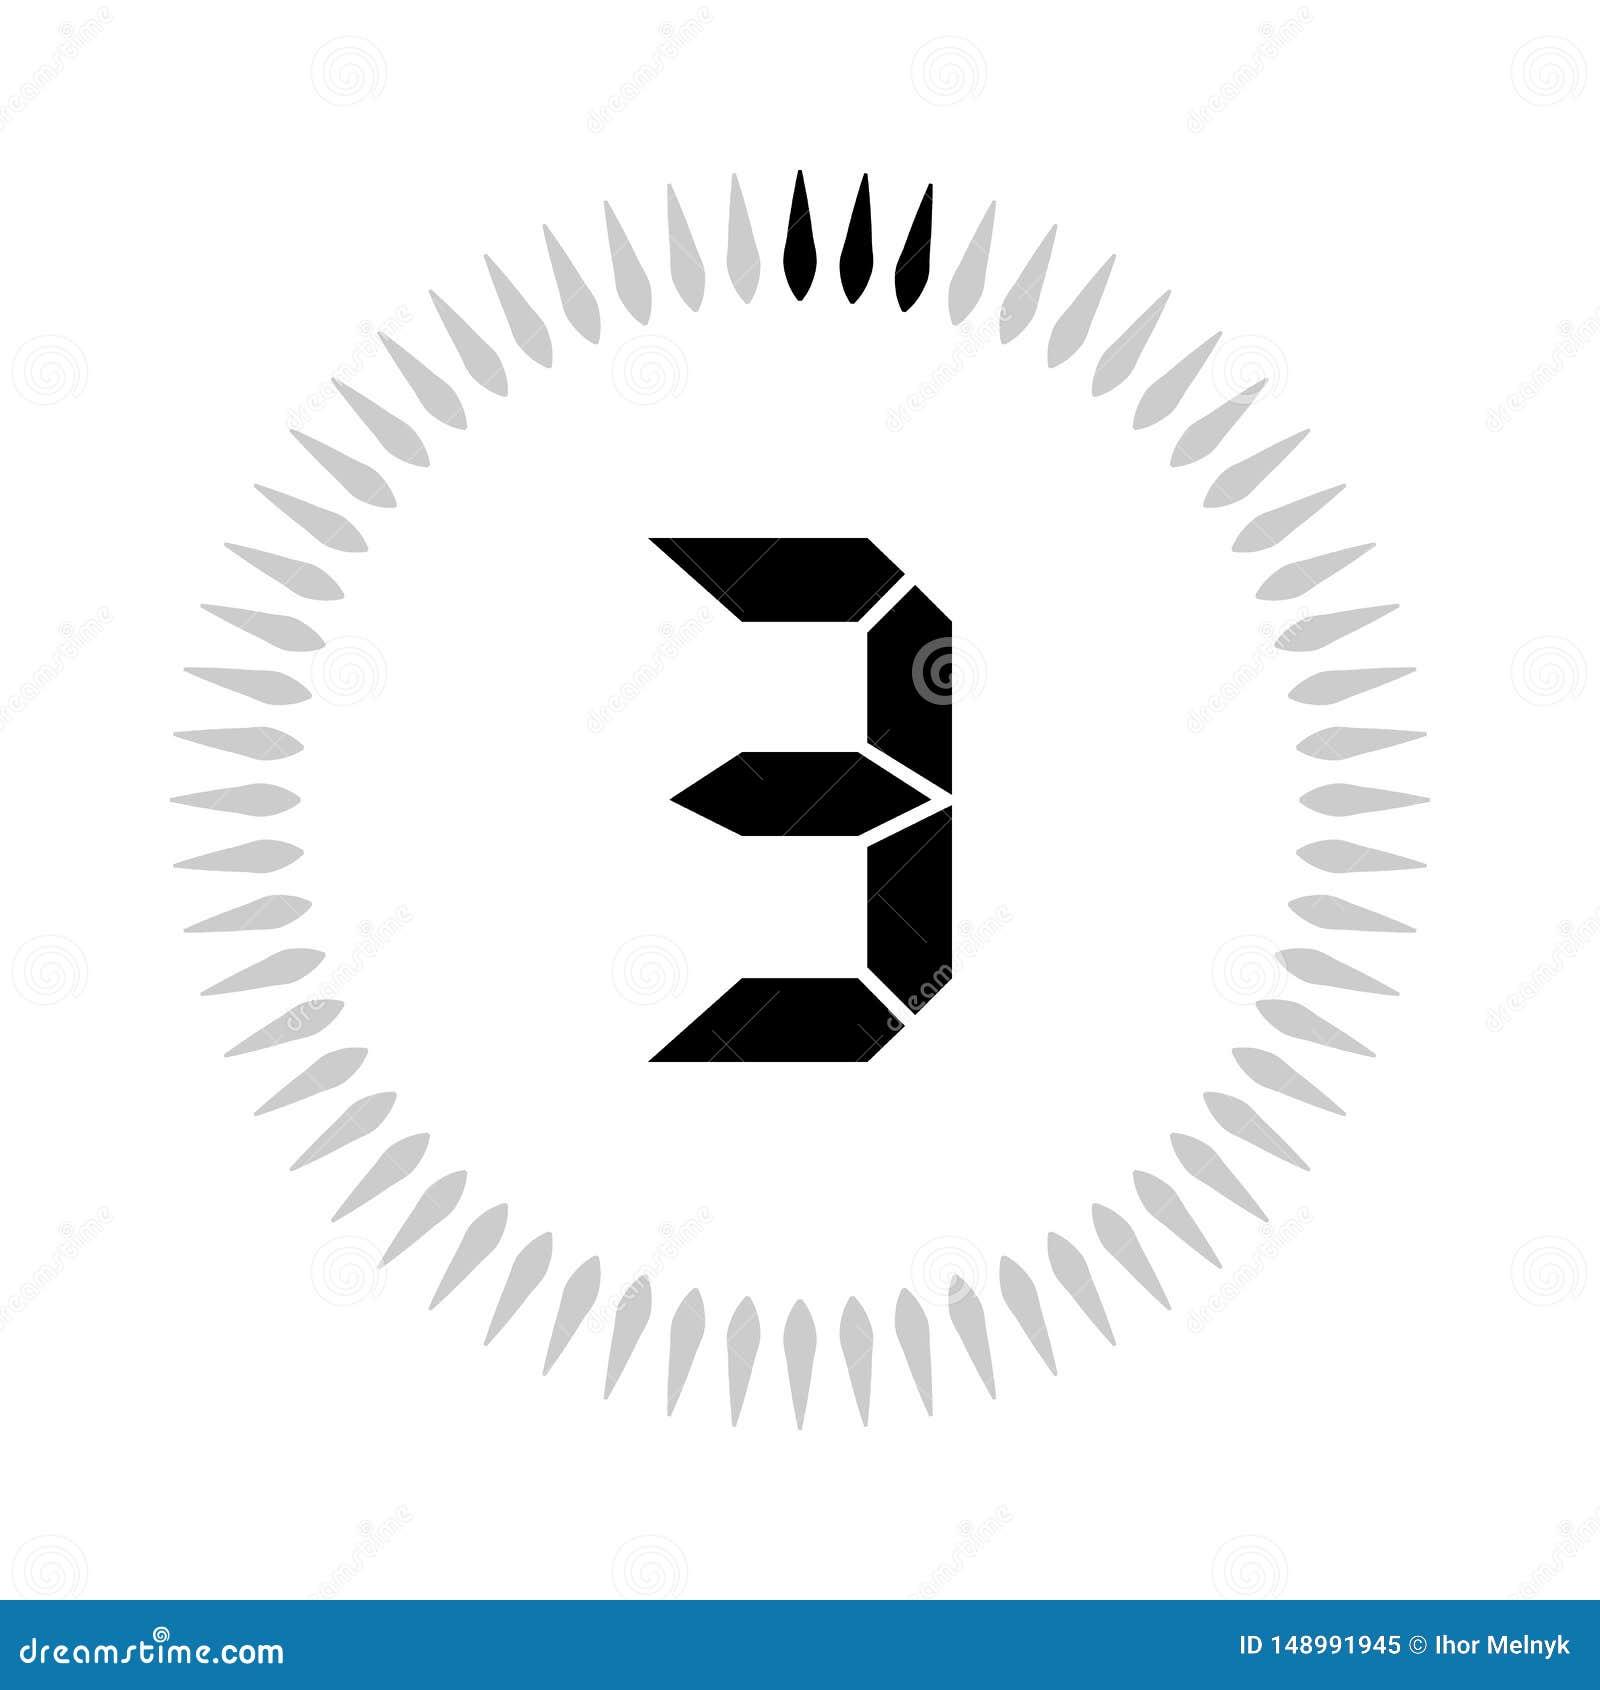 Les 3 minuteries de minutes ou de secondes